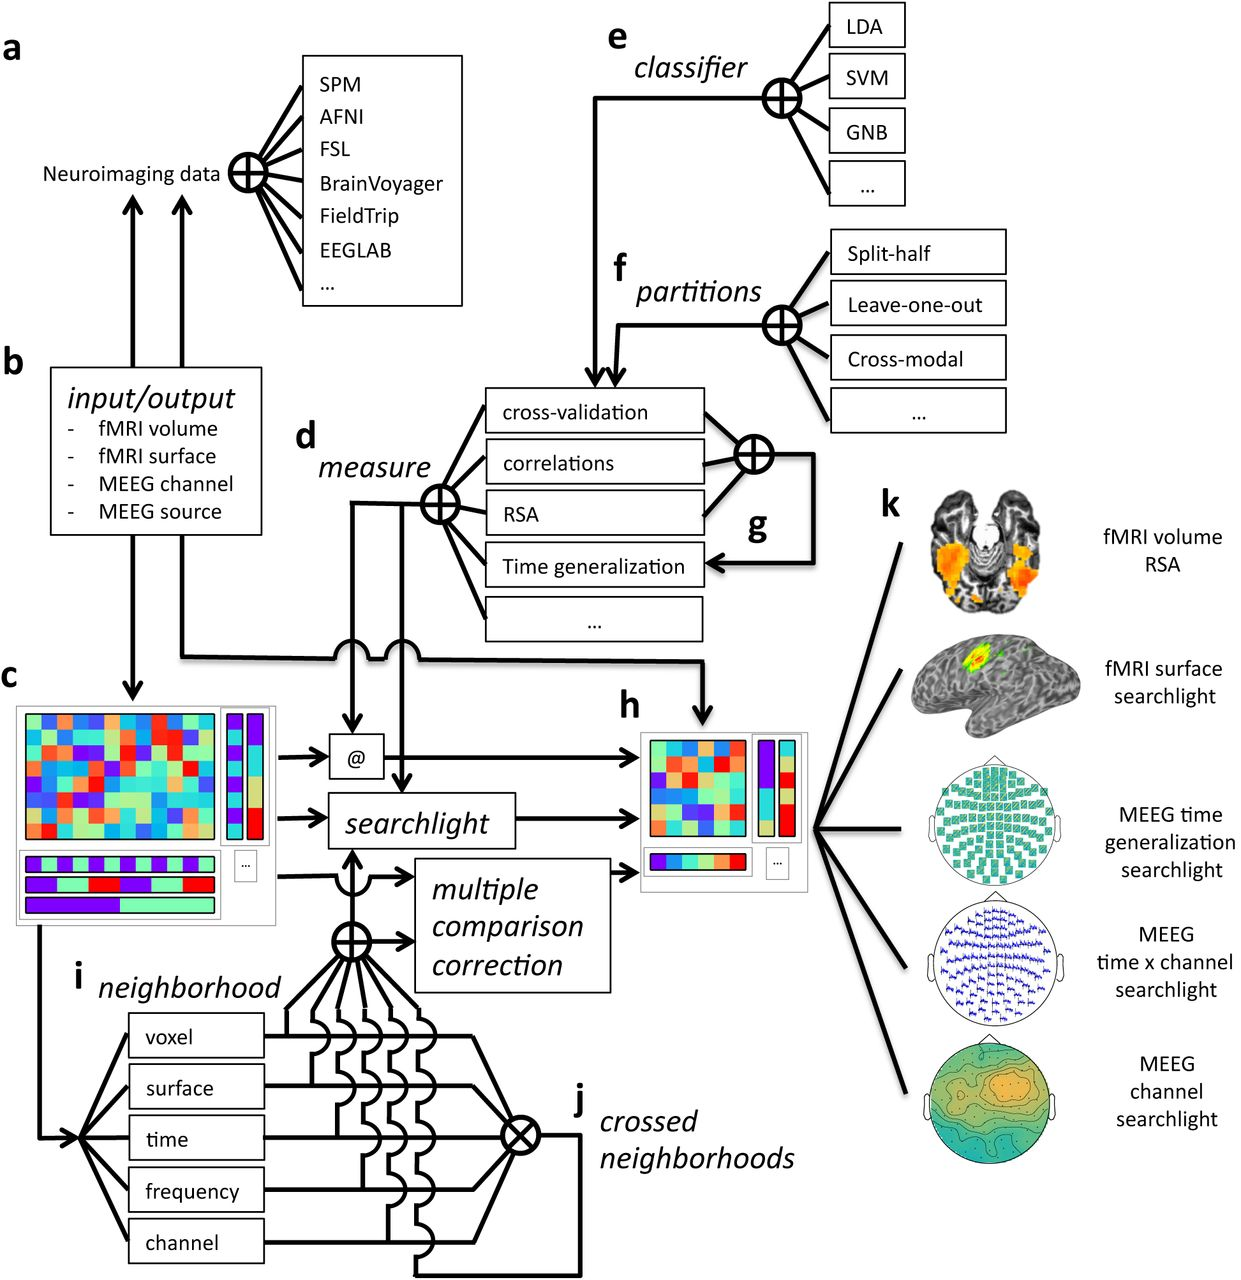 CoSMoMVPA: multi-modal multivariate pattern analysis of neuroimaging